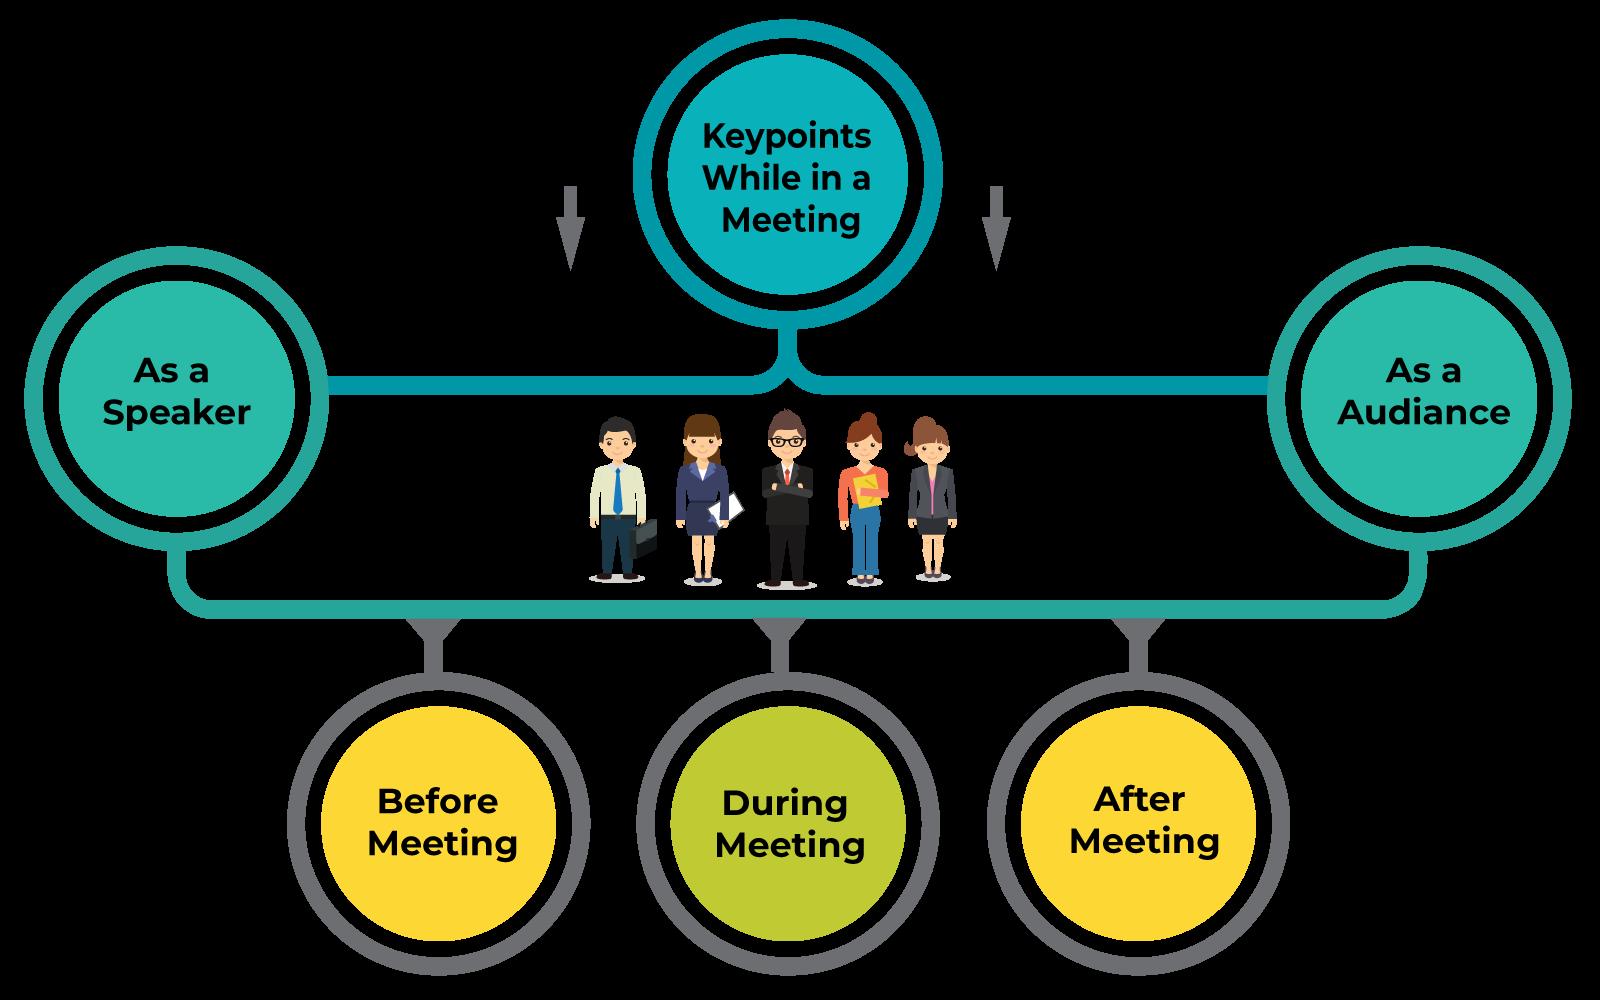 Audiance-Speaker-Meeting-Keypoints